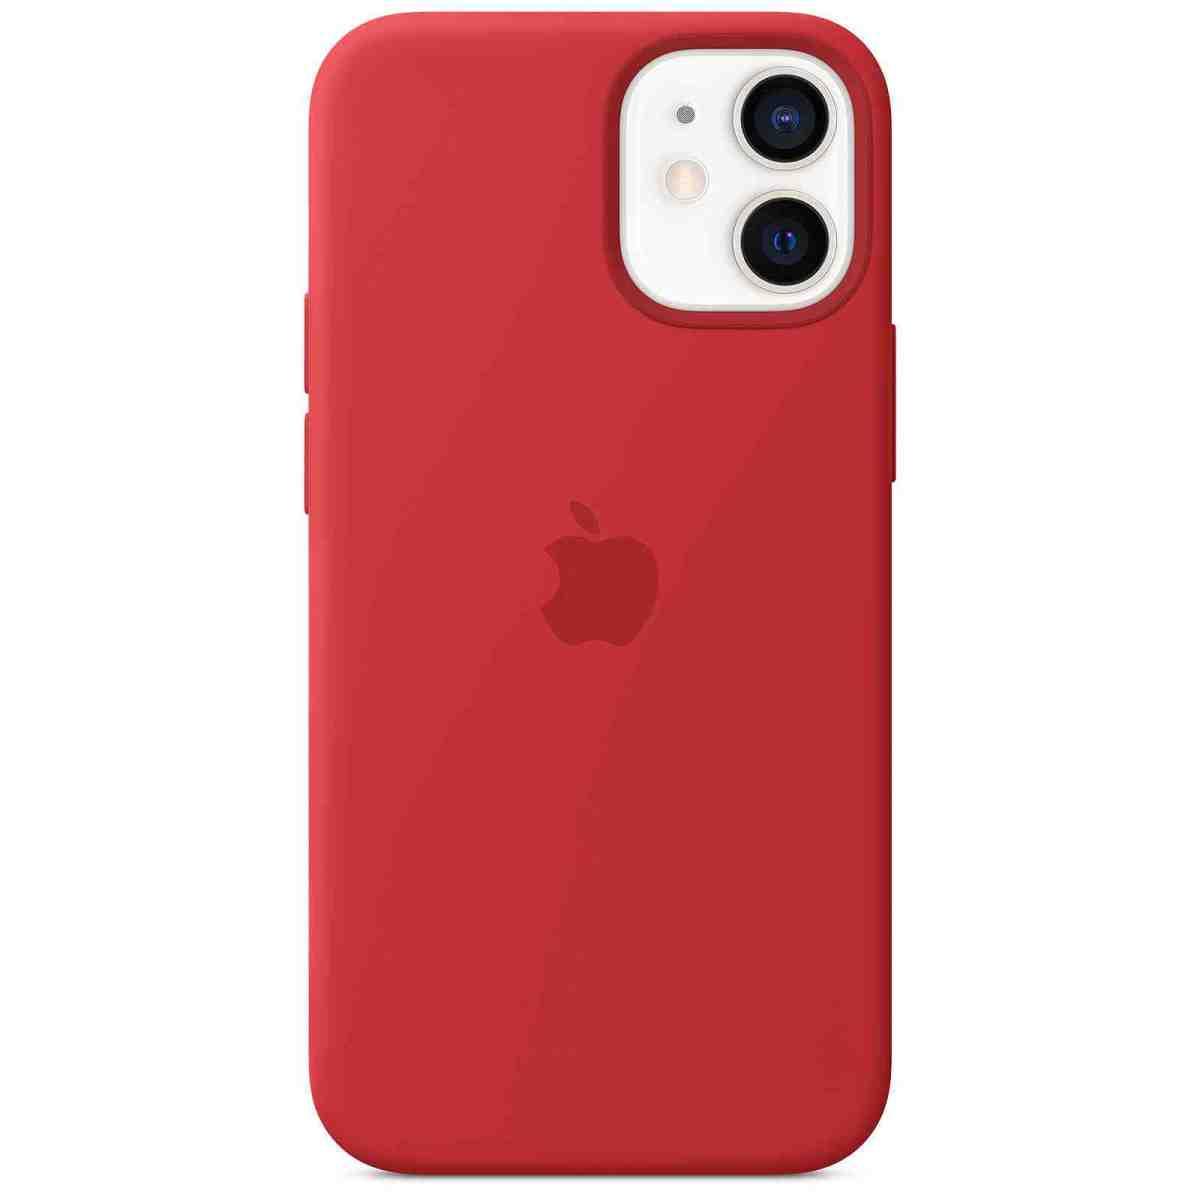 Où acheter coque iPhone 12 ?